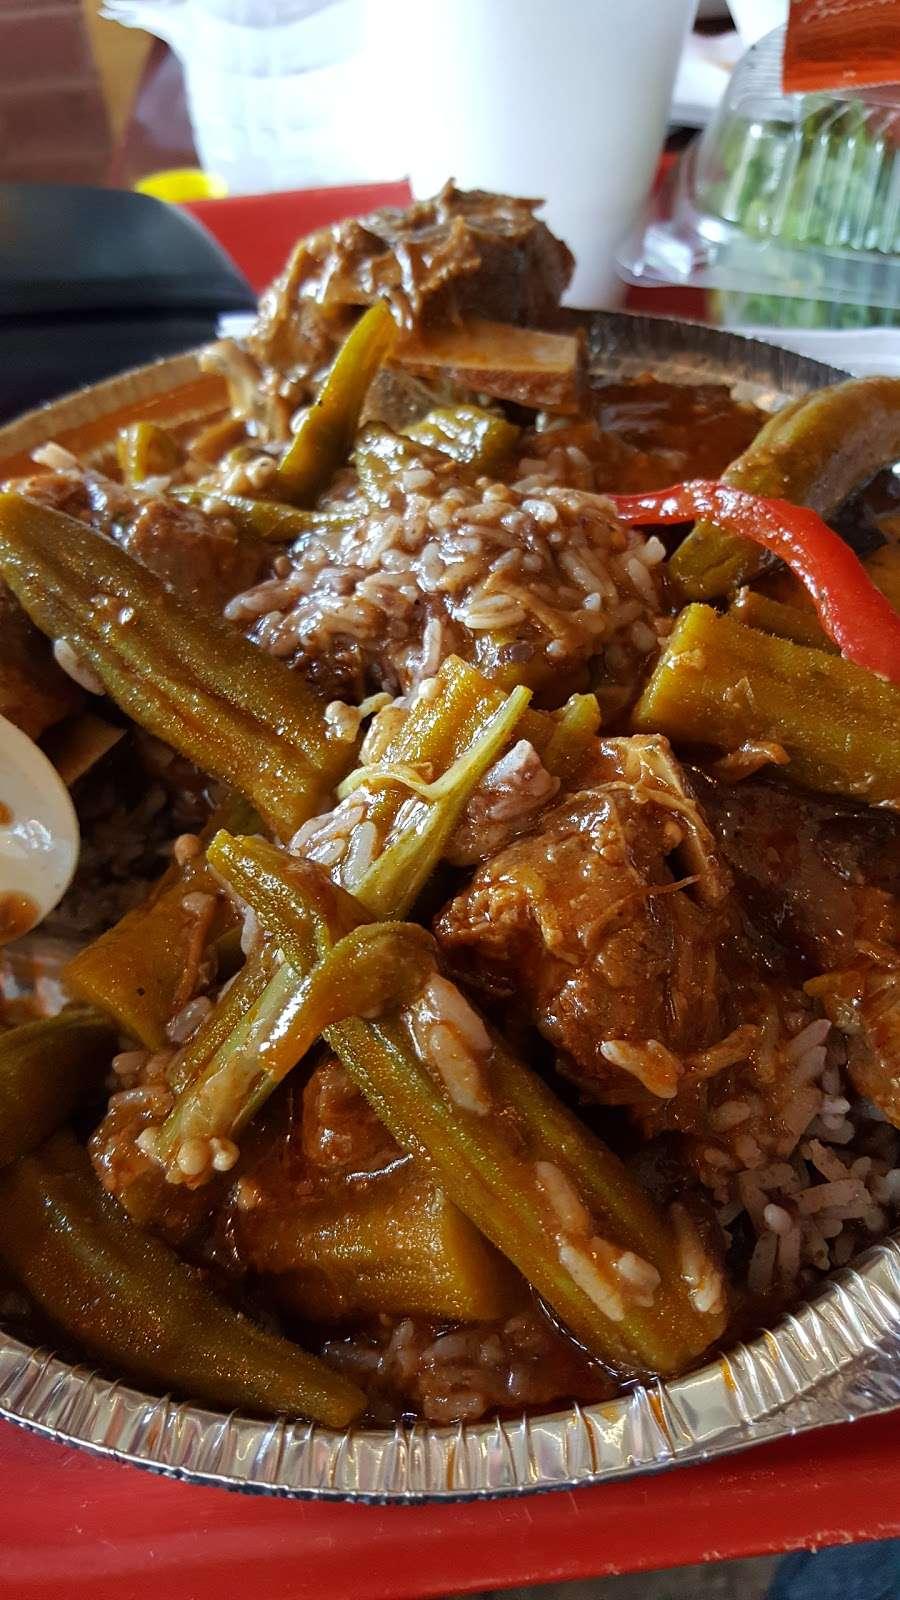 Kreyol Flavor - restaurant  | Photo 4 of 10 | Address: 1738 Flatbush Ave, Brooklyn, NY 11210, USA | Phone: (718) 258-0509